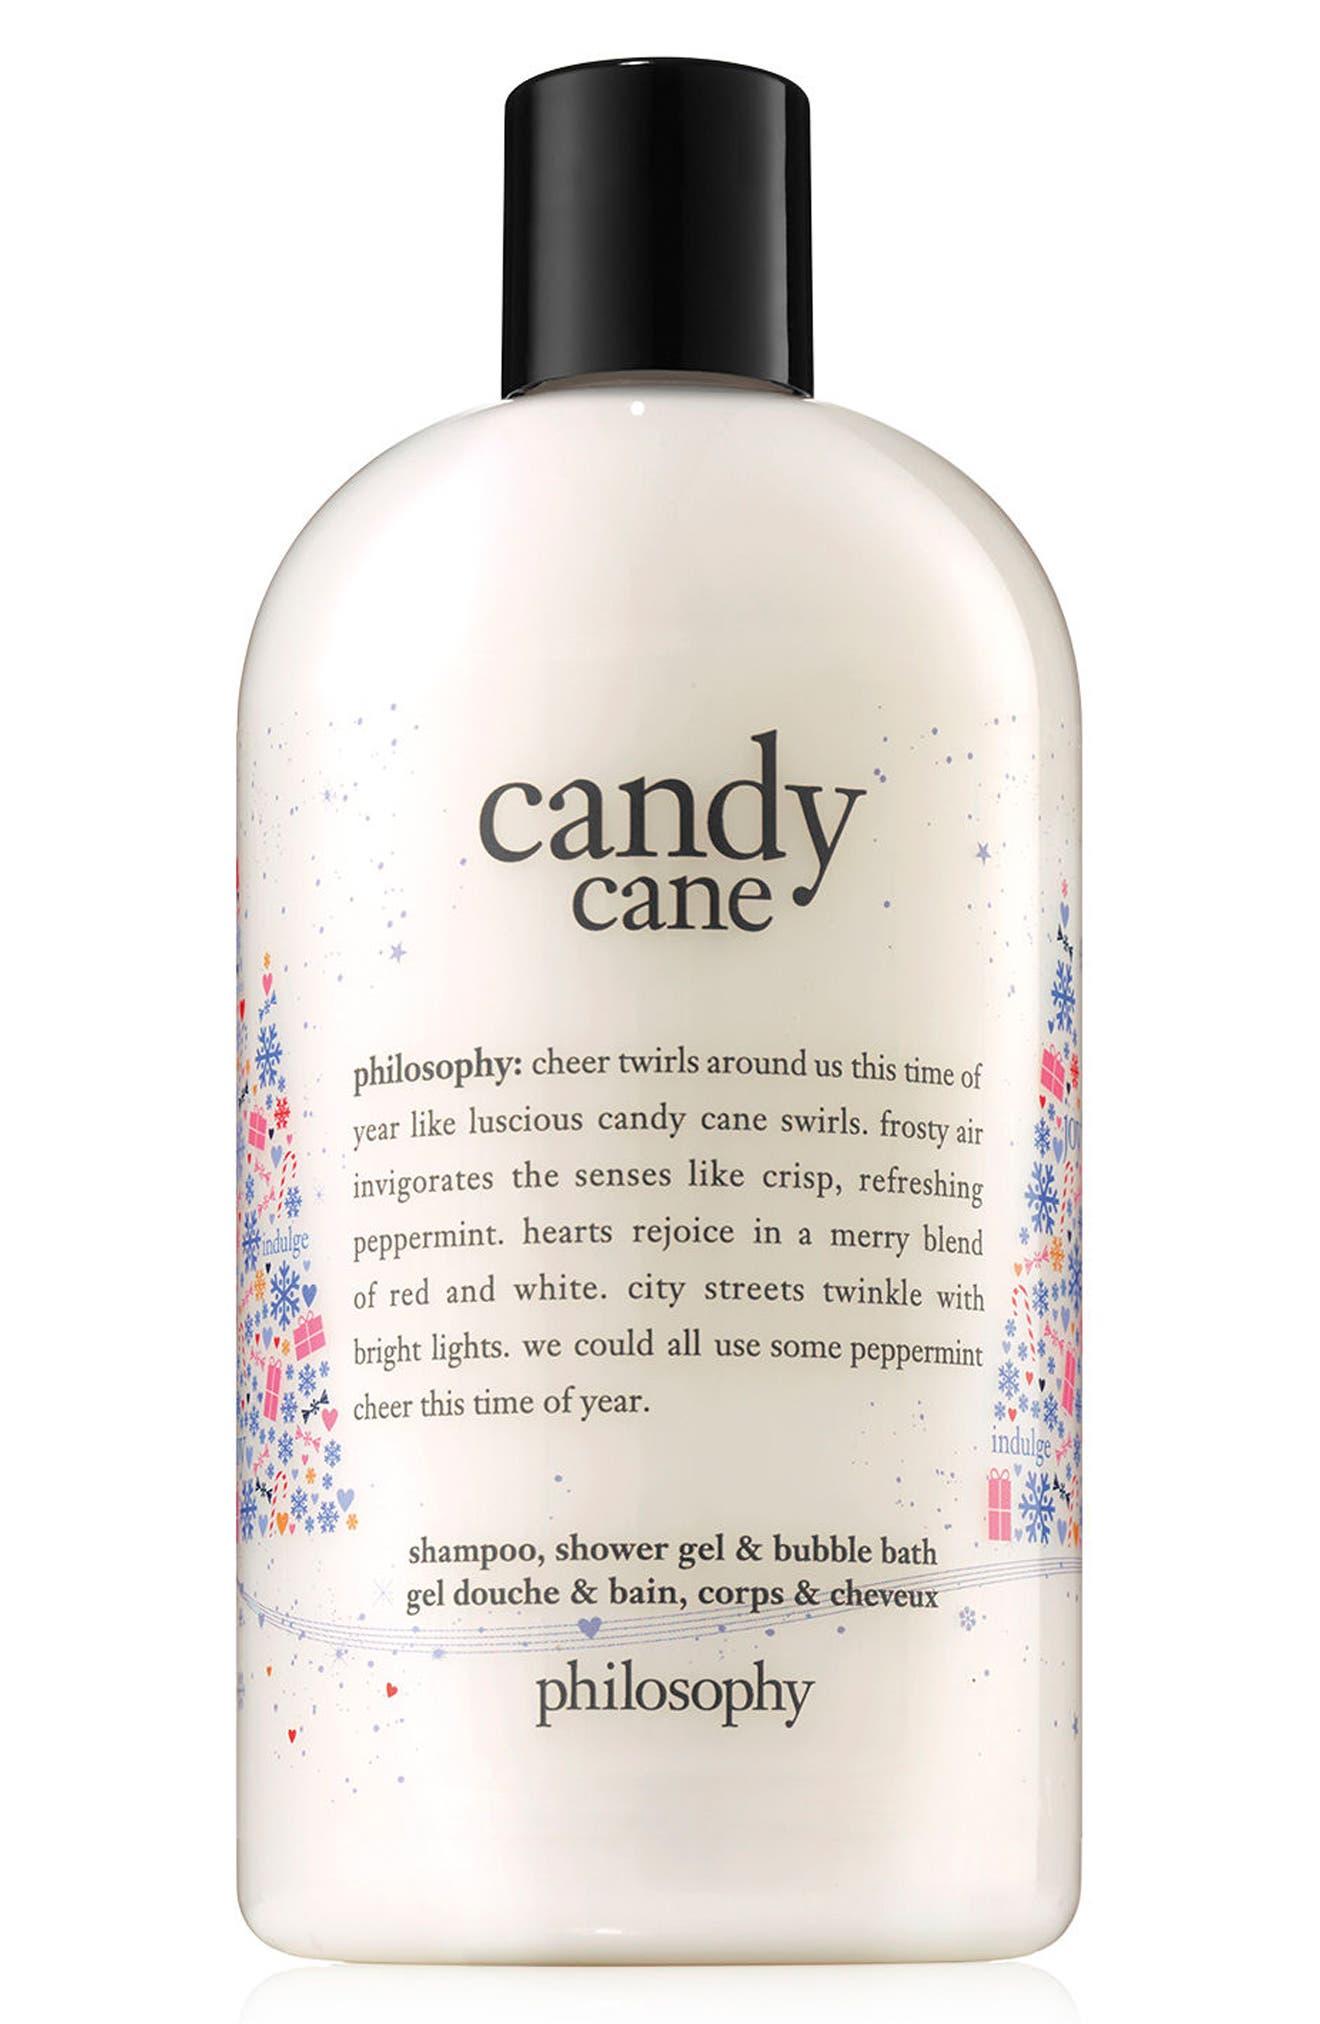 Philosophy Candy Cane Shampoo Shower Gel Bubble Bath Limited Edition